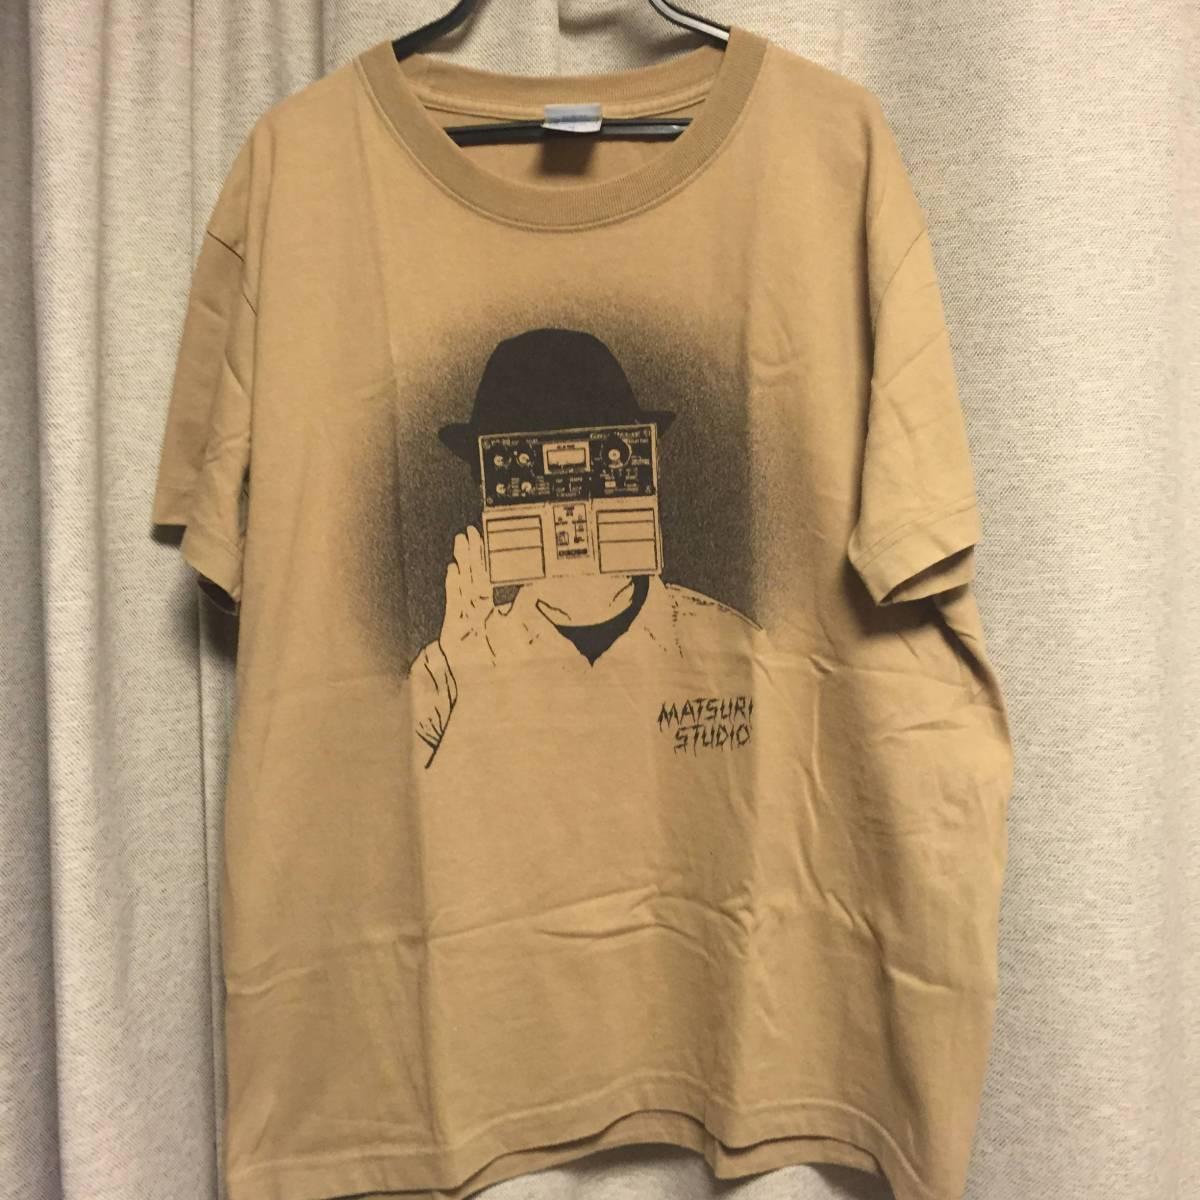 ZAZEN BOYS Tシャツ M